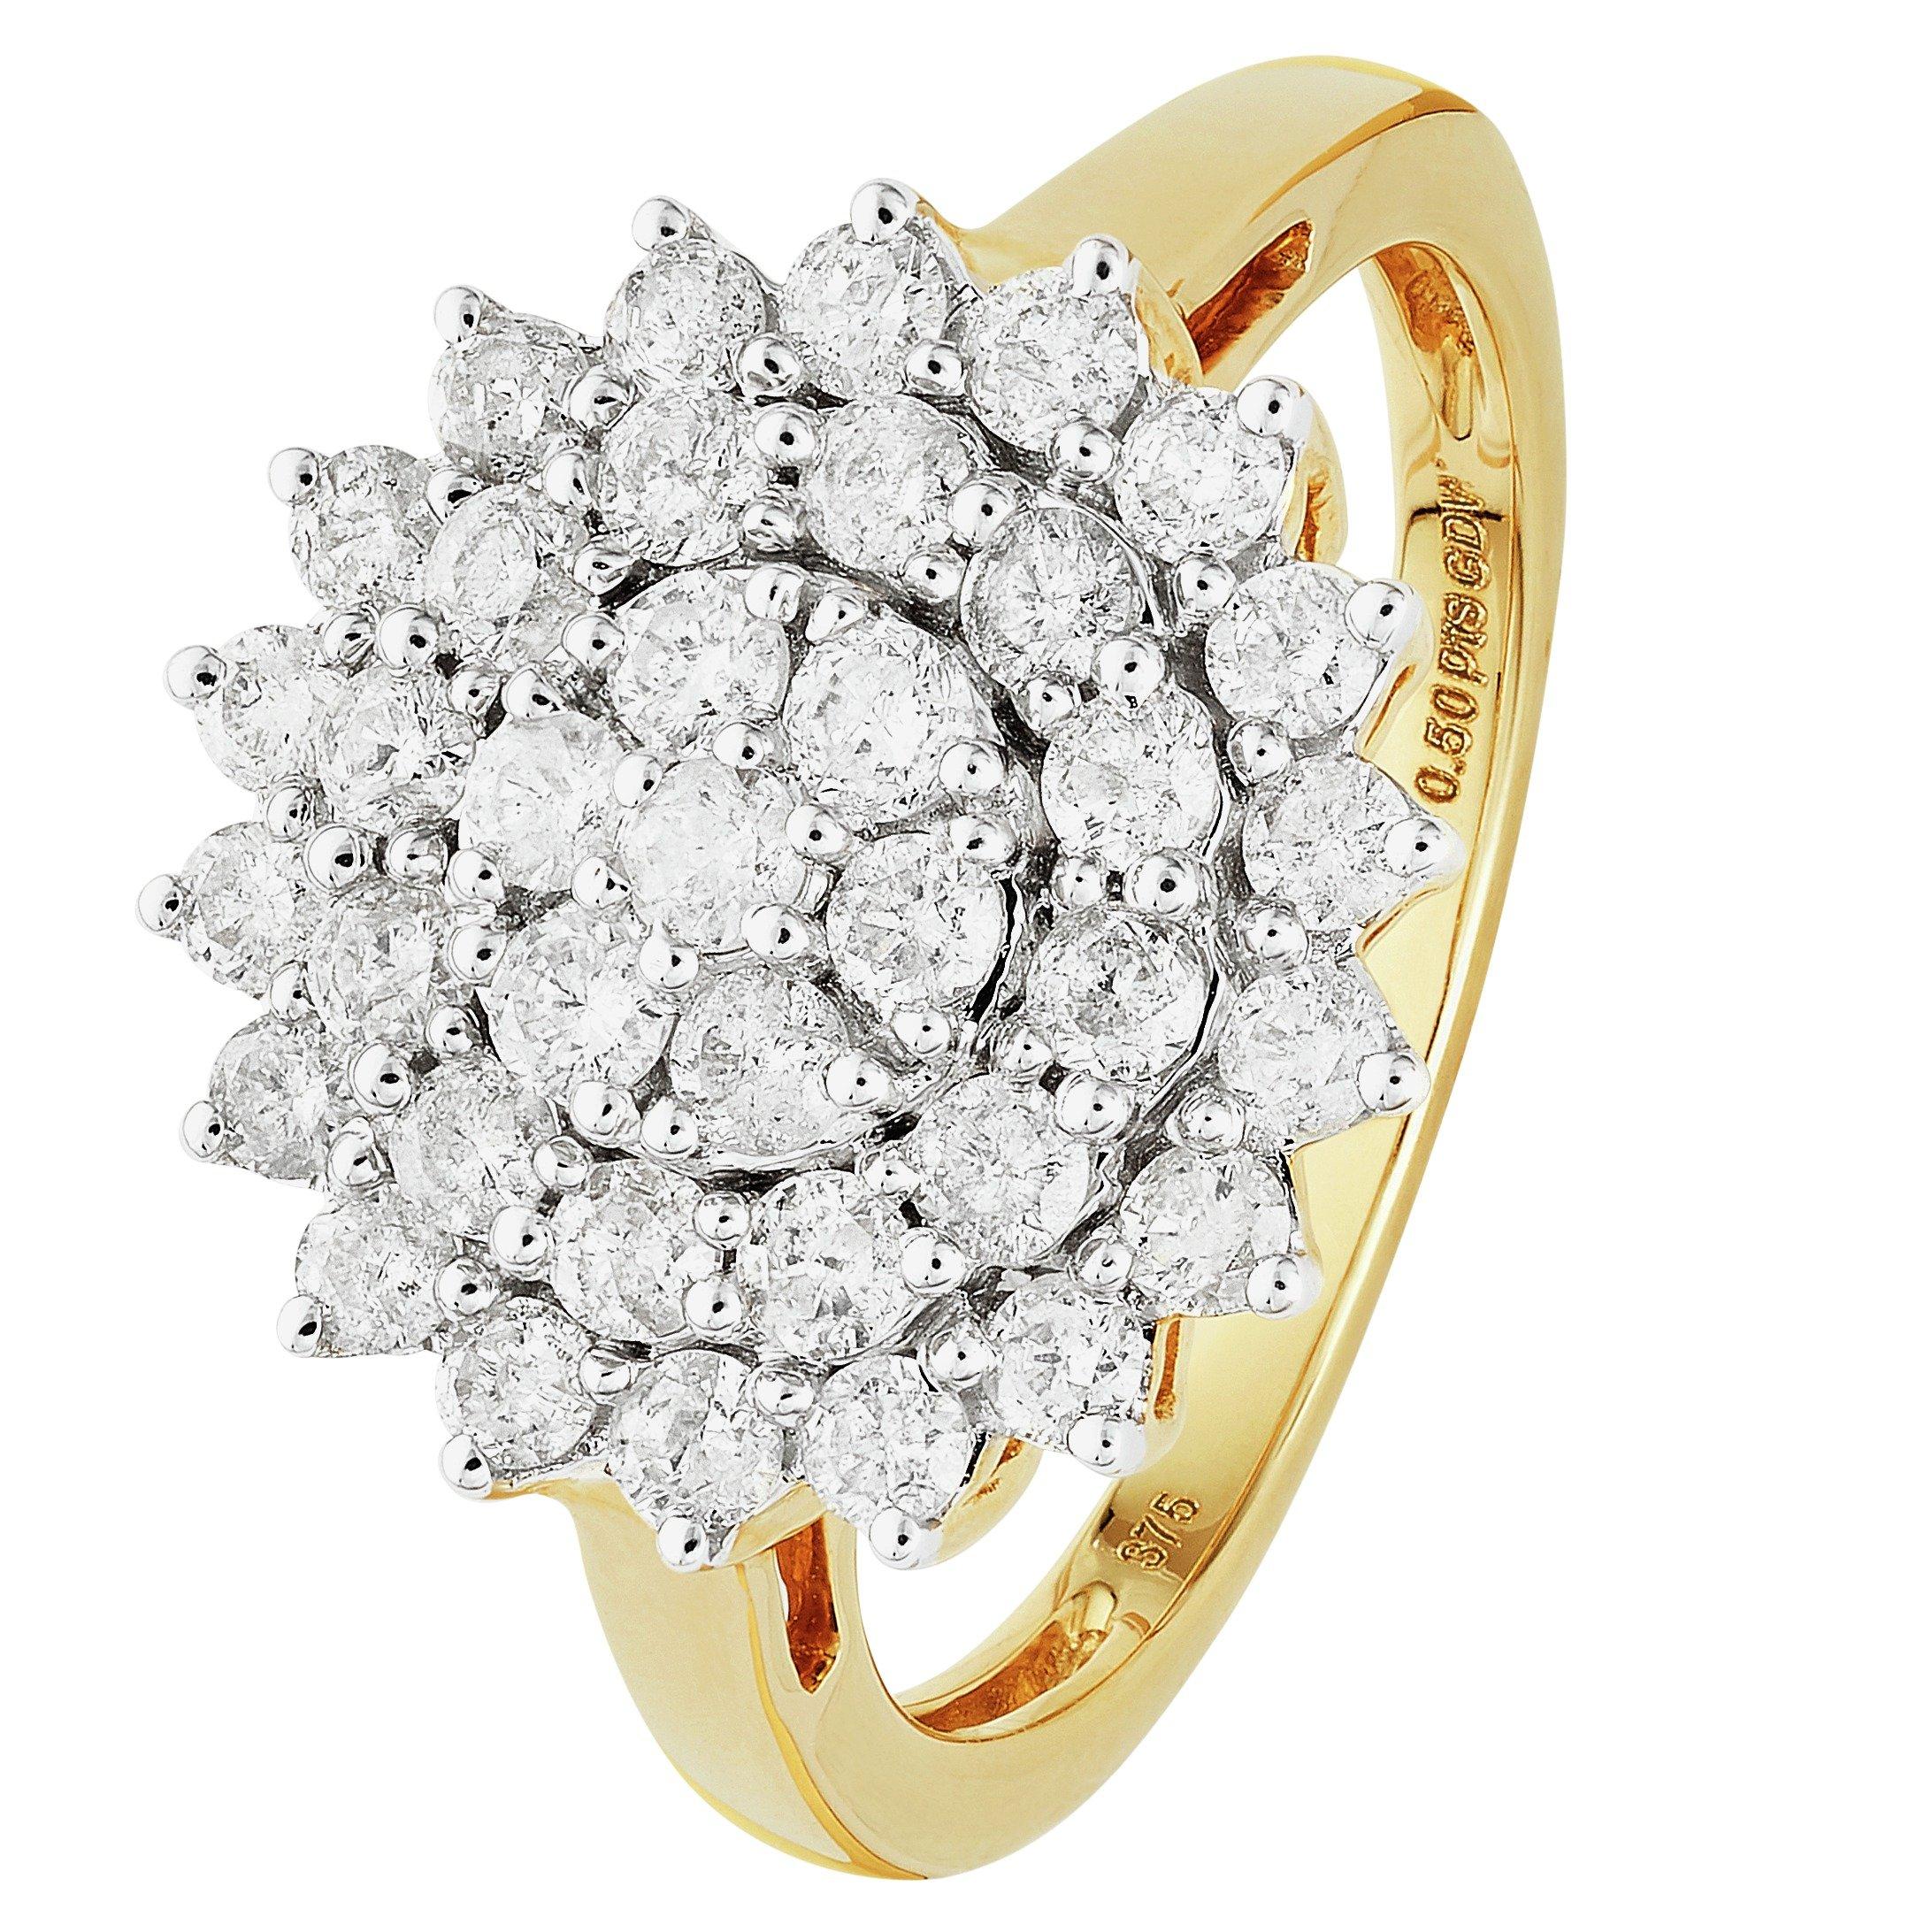 Buy Revere 9ct Gold 1 00ct tw Diamond Cluster Ring at Argos